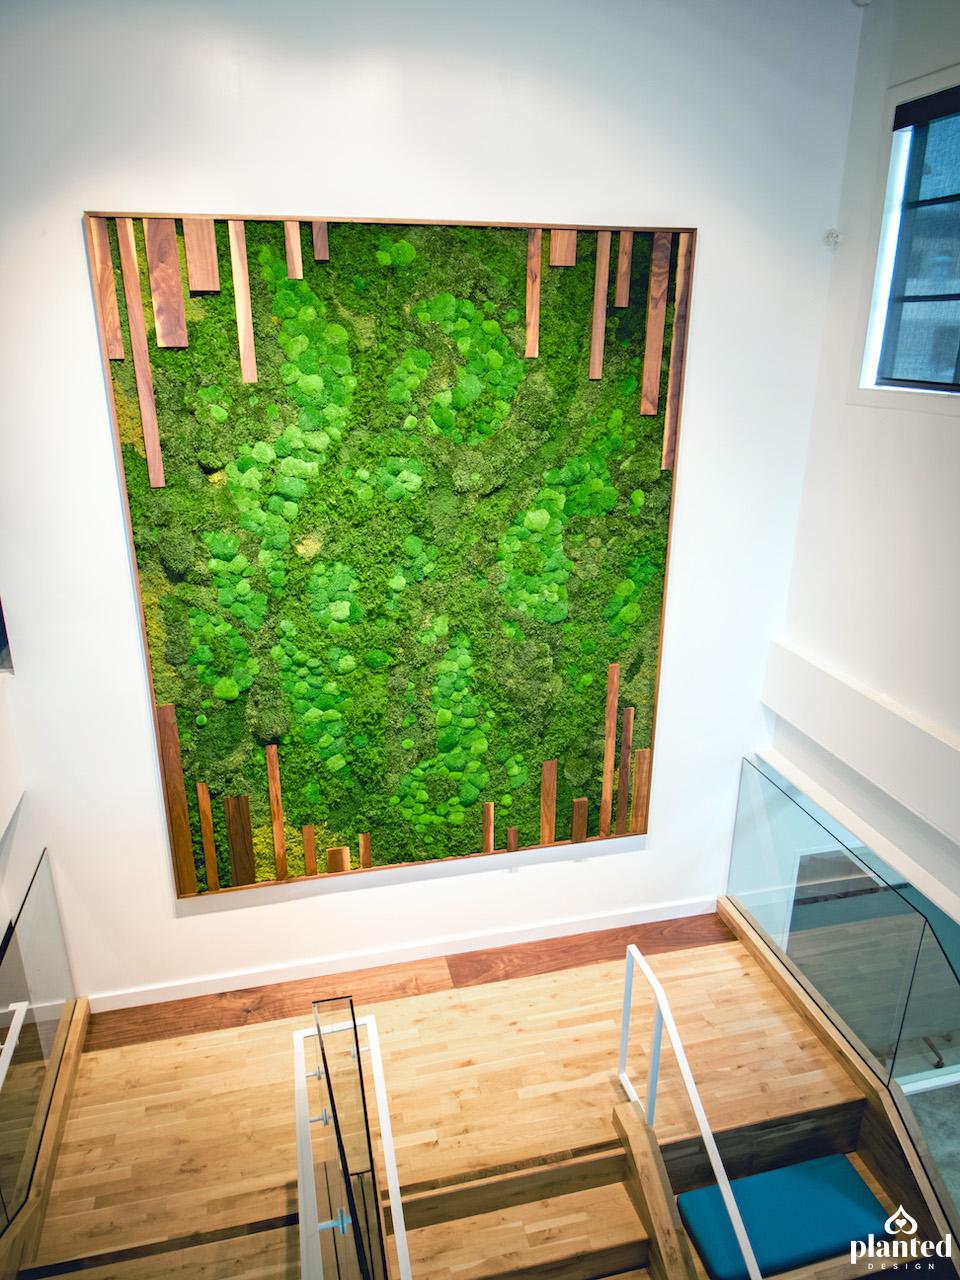 PlantedDesign_MossWall_PerfectDayFoods_Emeryville_California_Office-3_fixed.jpg